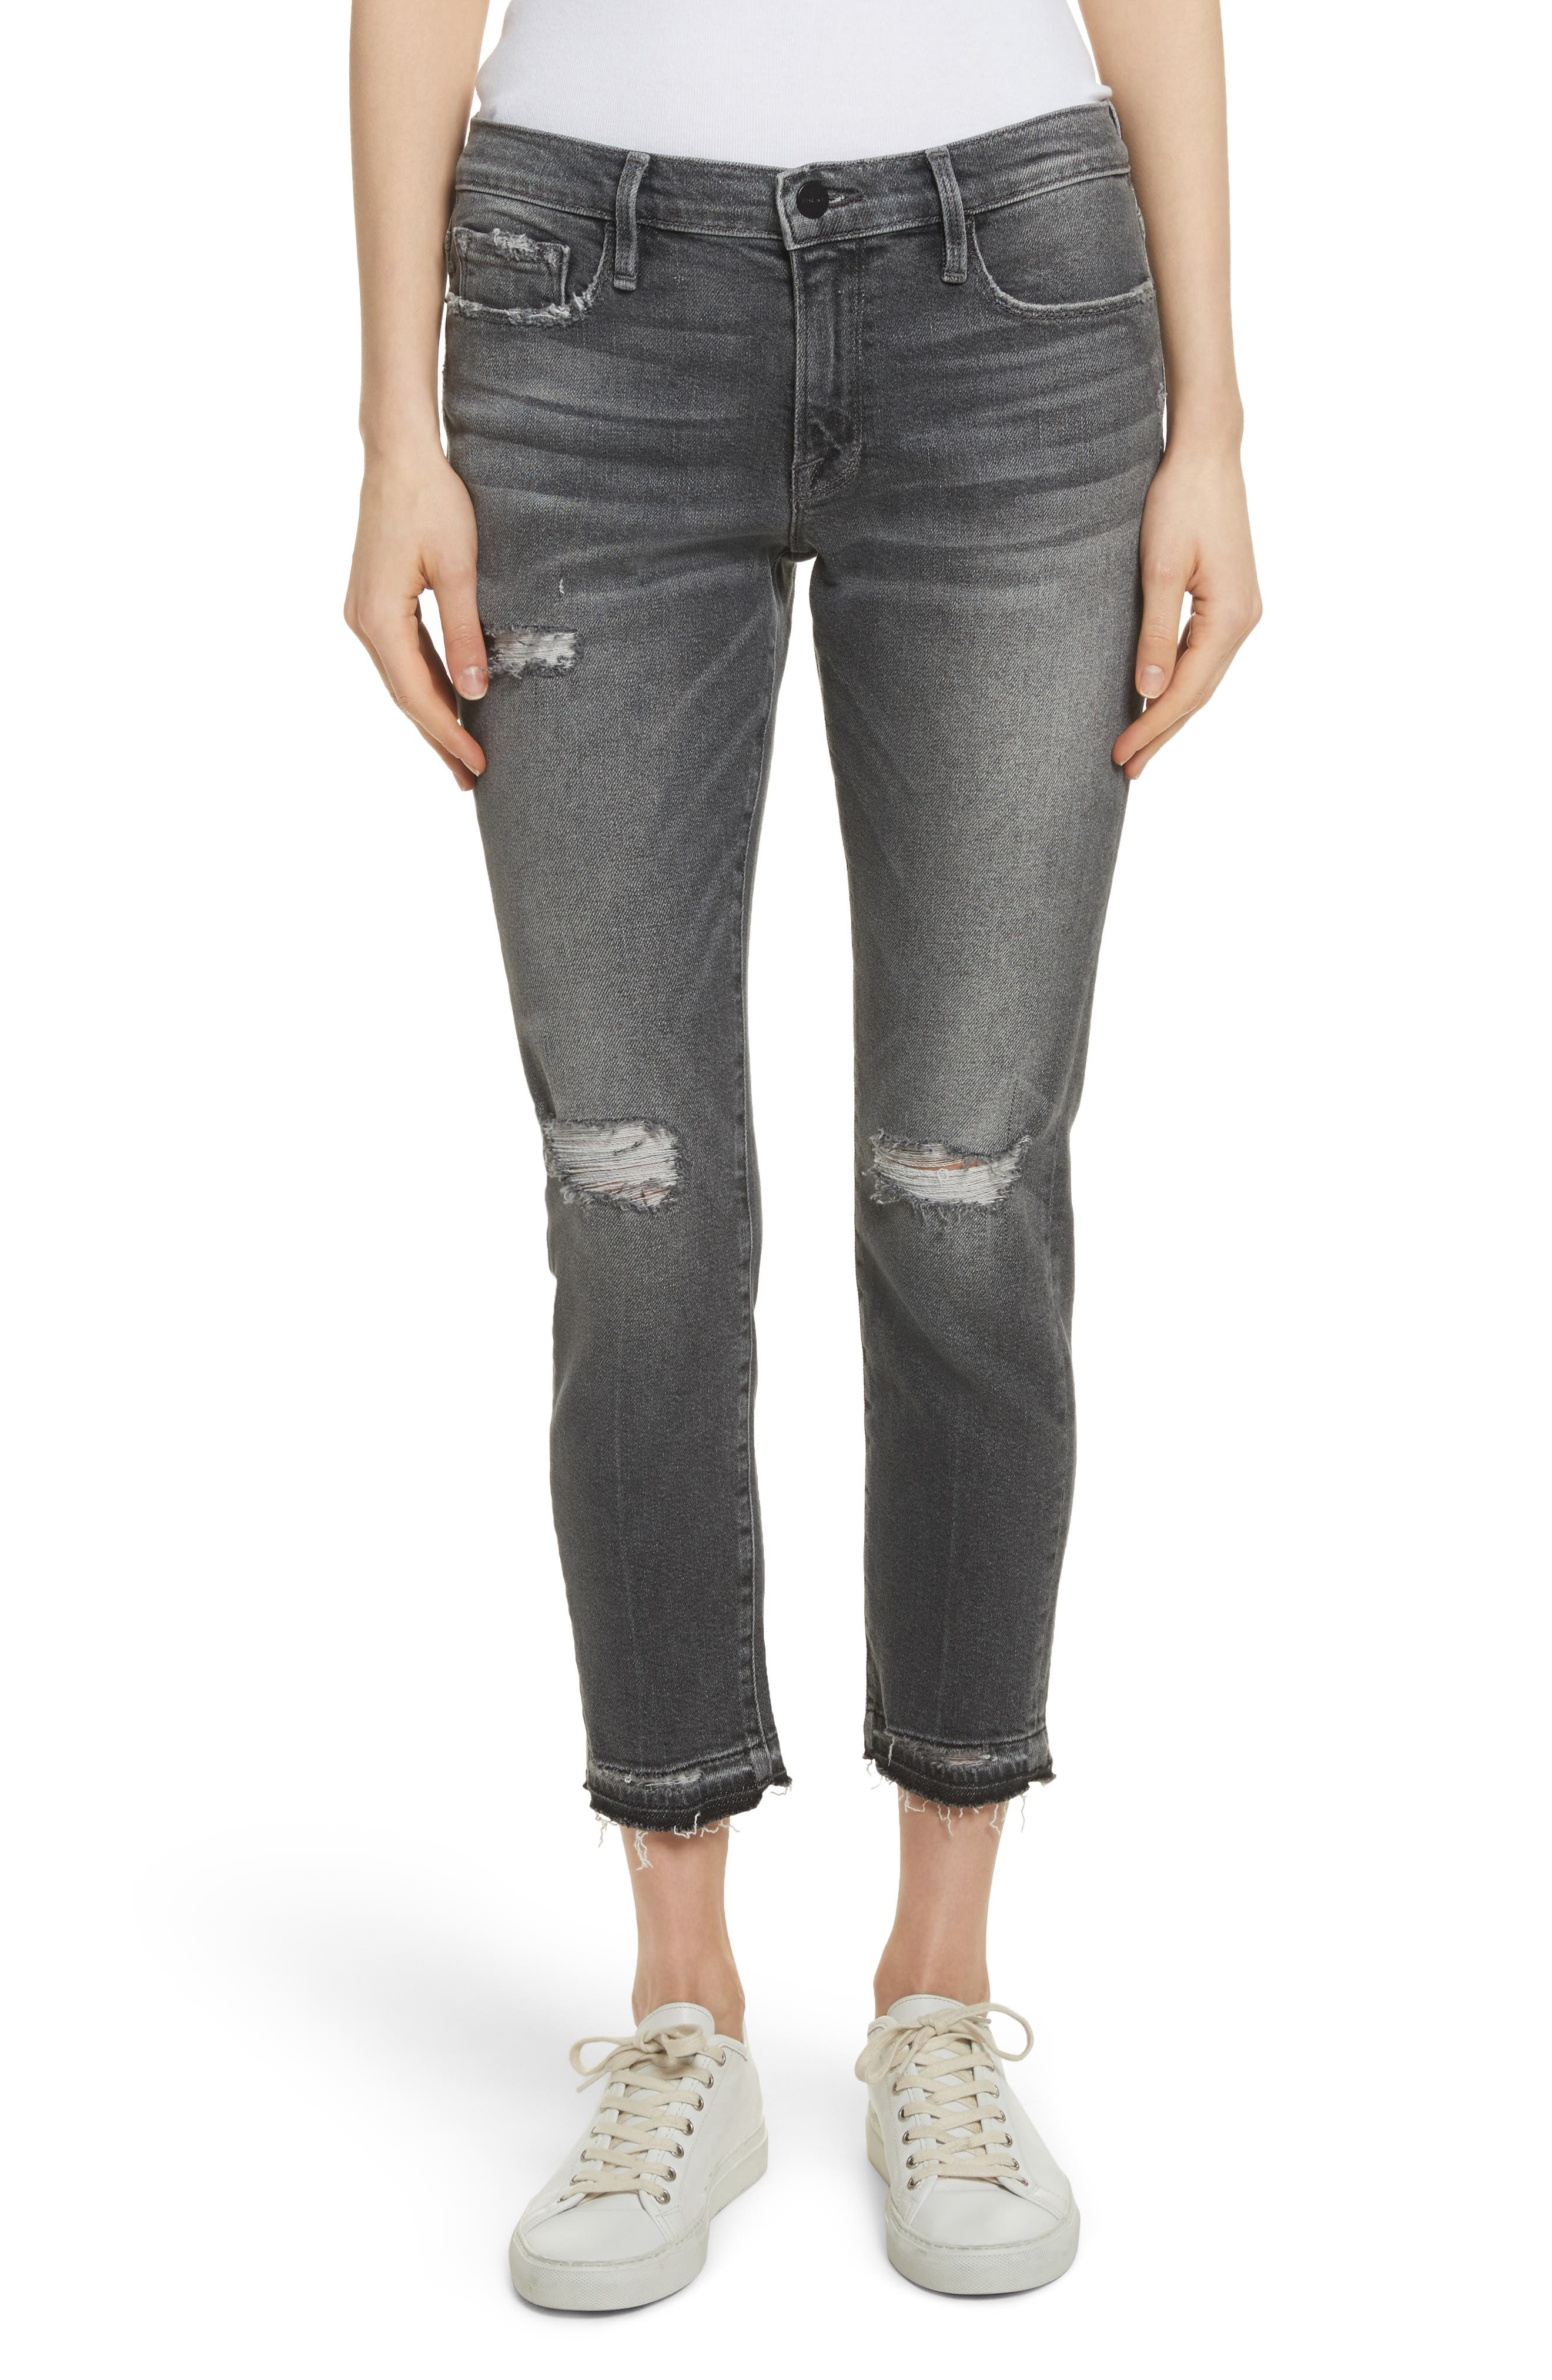 Le Garçon Ripped Released Hem Slim Jeans,                             Main thumbnail 1, color,                             050